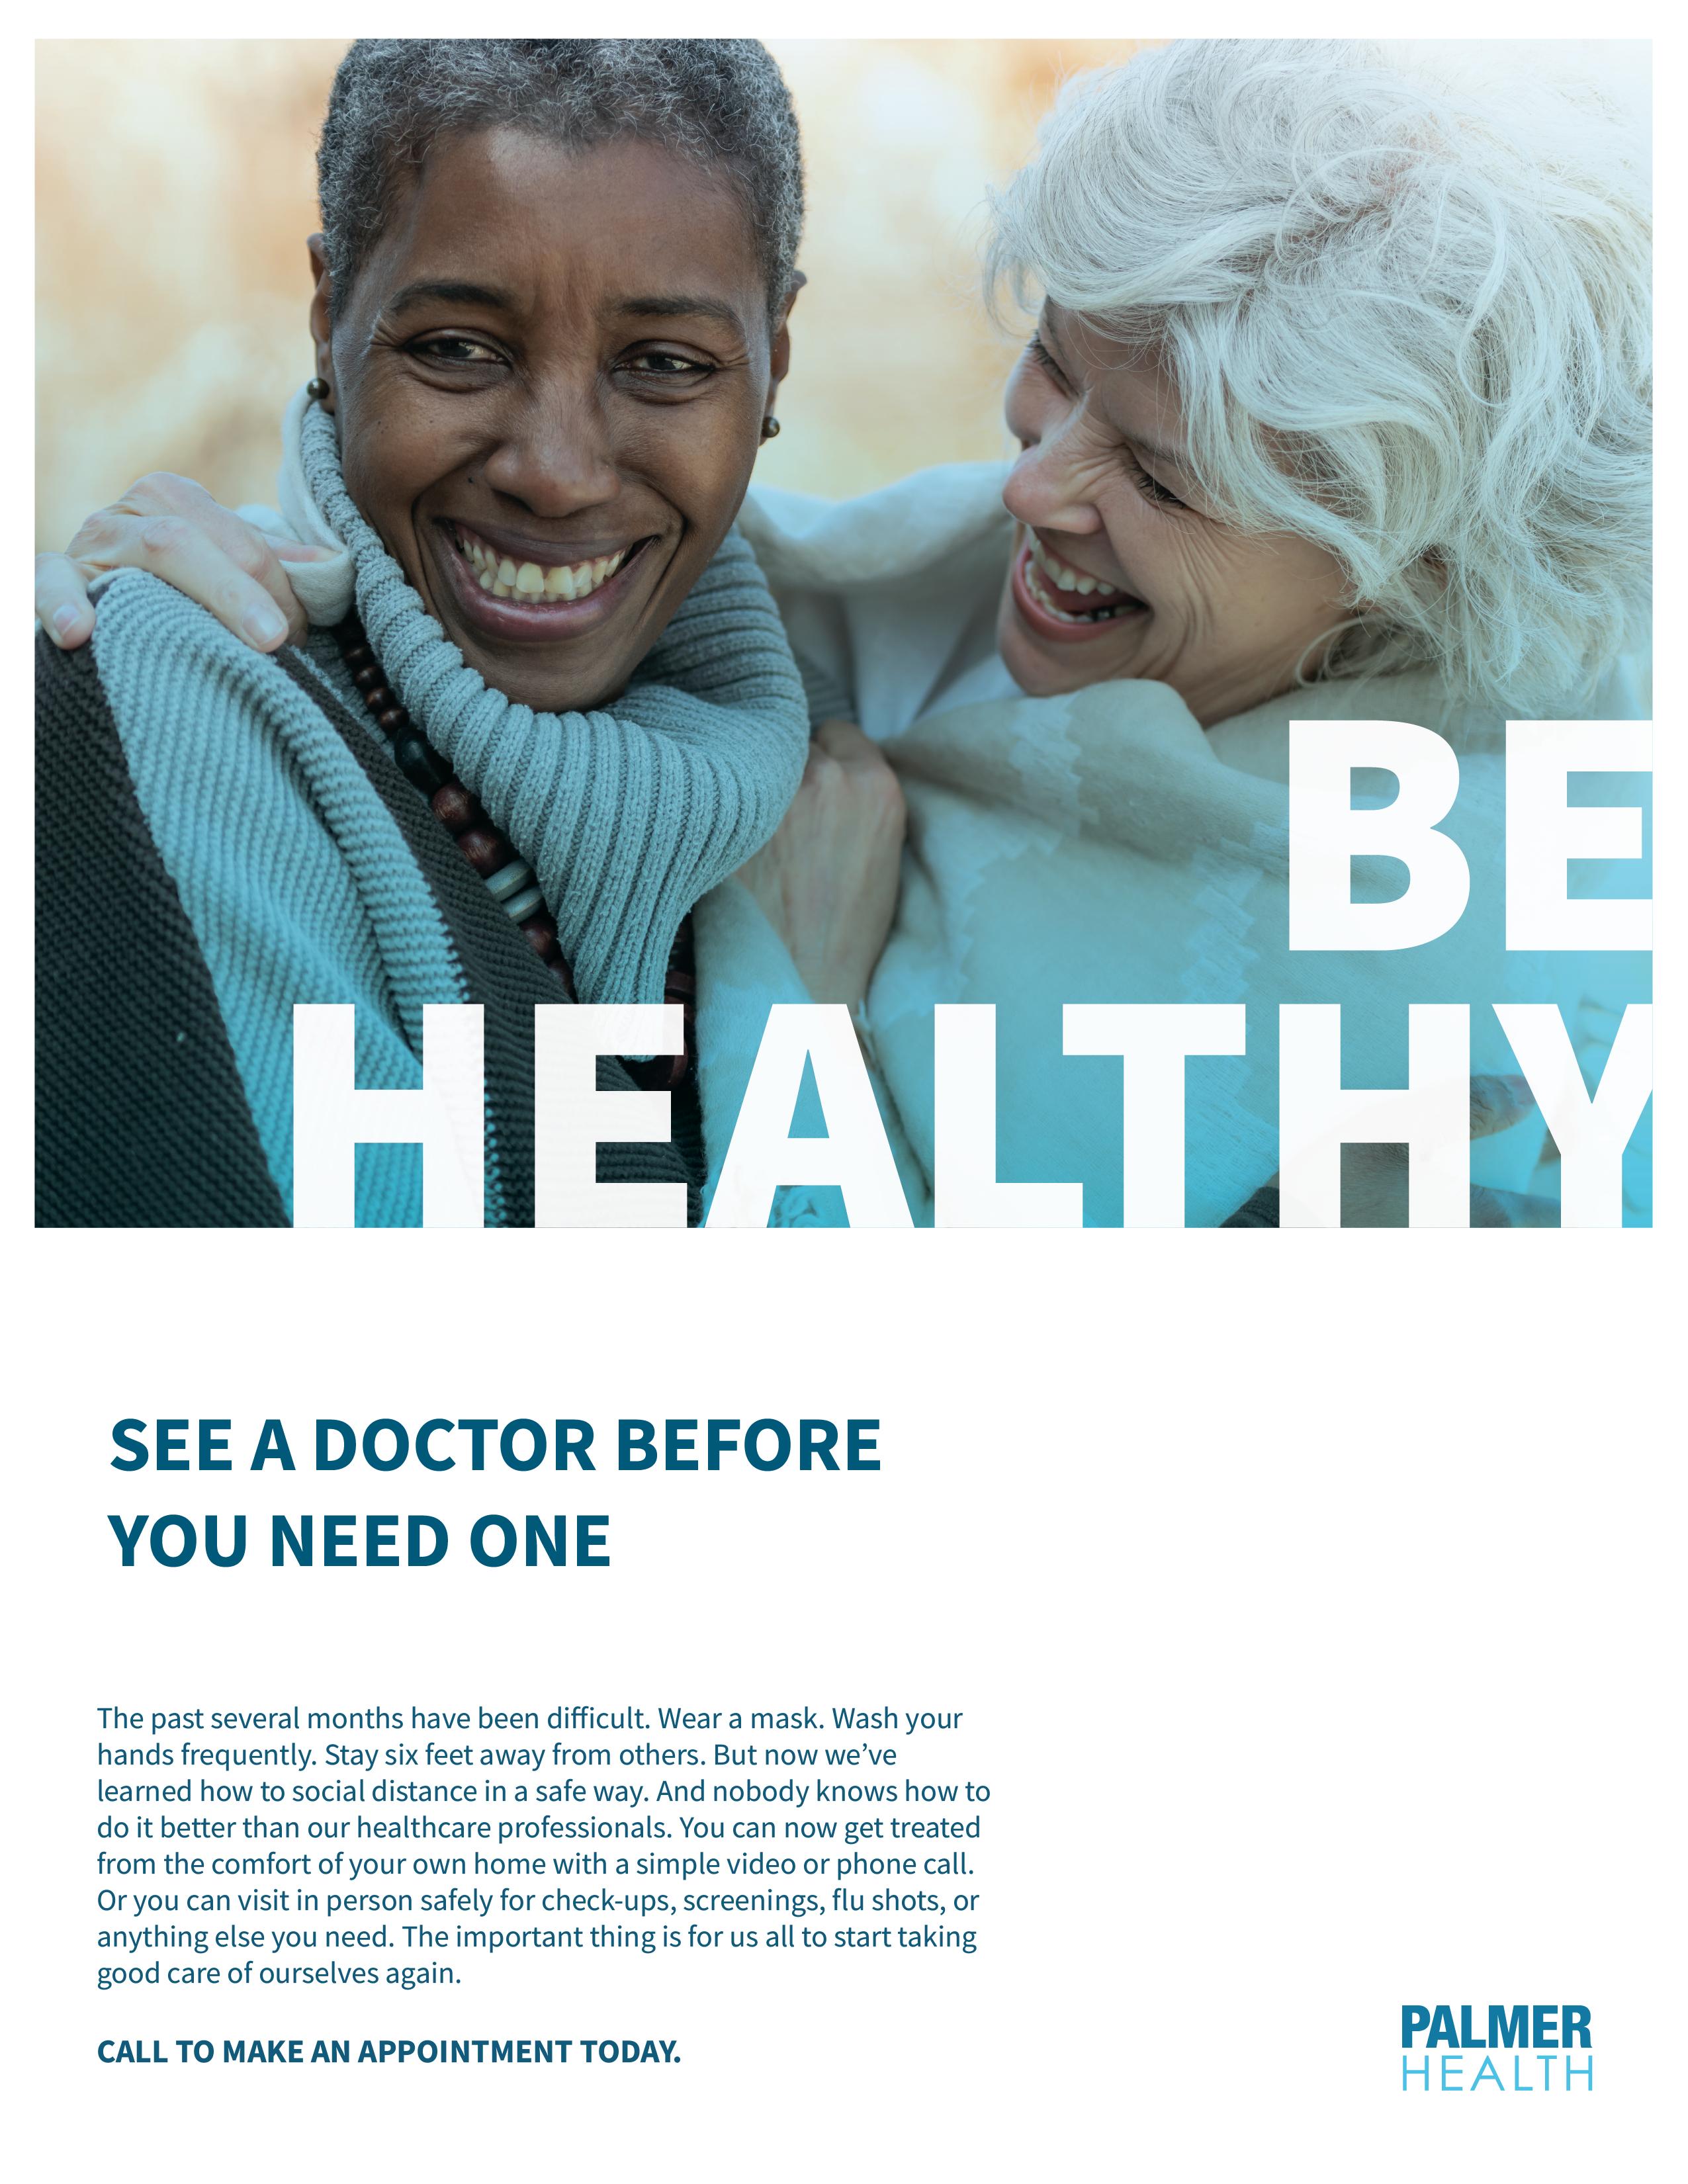 36152 Palmer health as dev for website-be  healthy-v5-aug 21-04